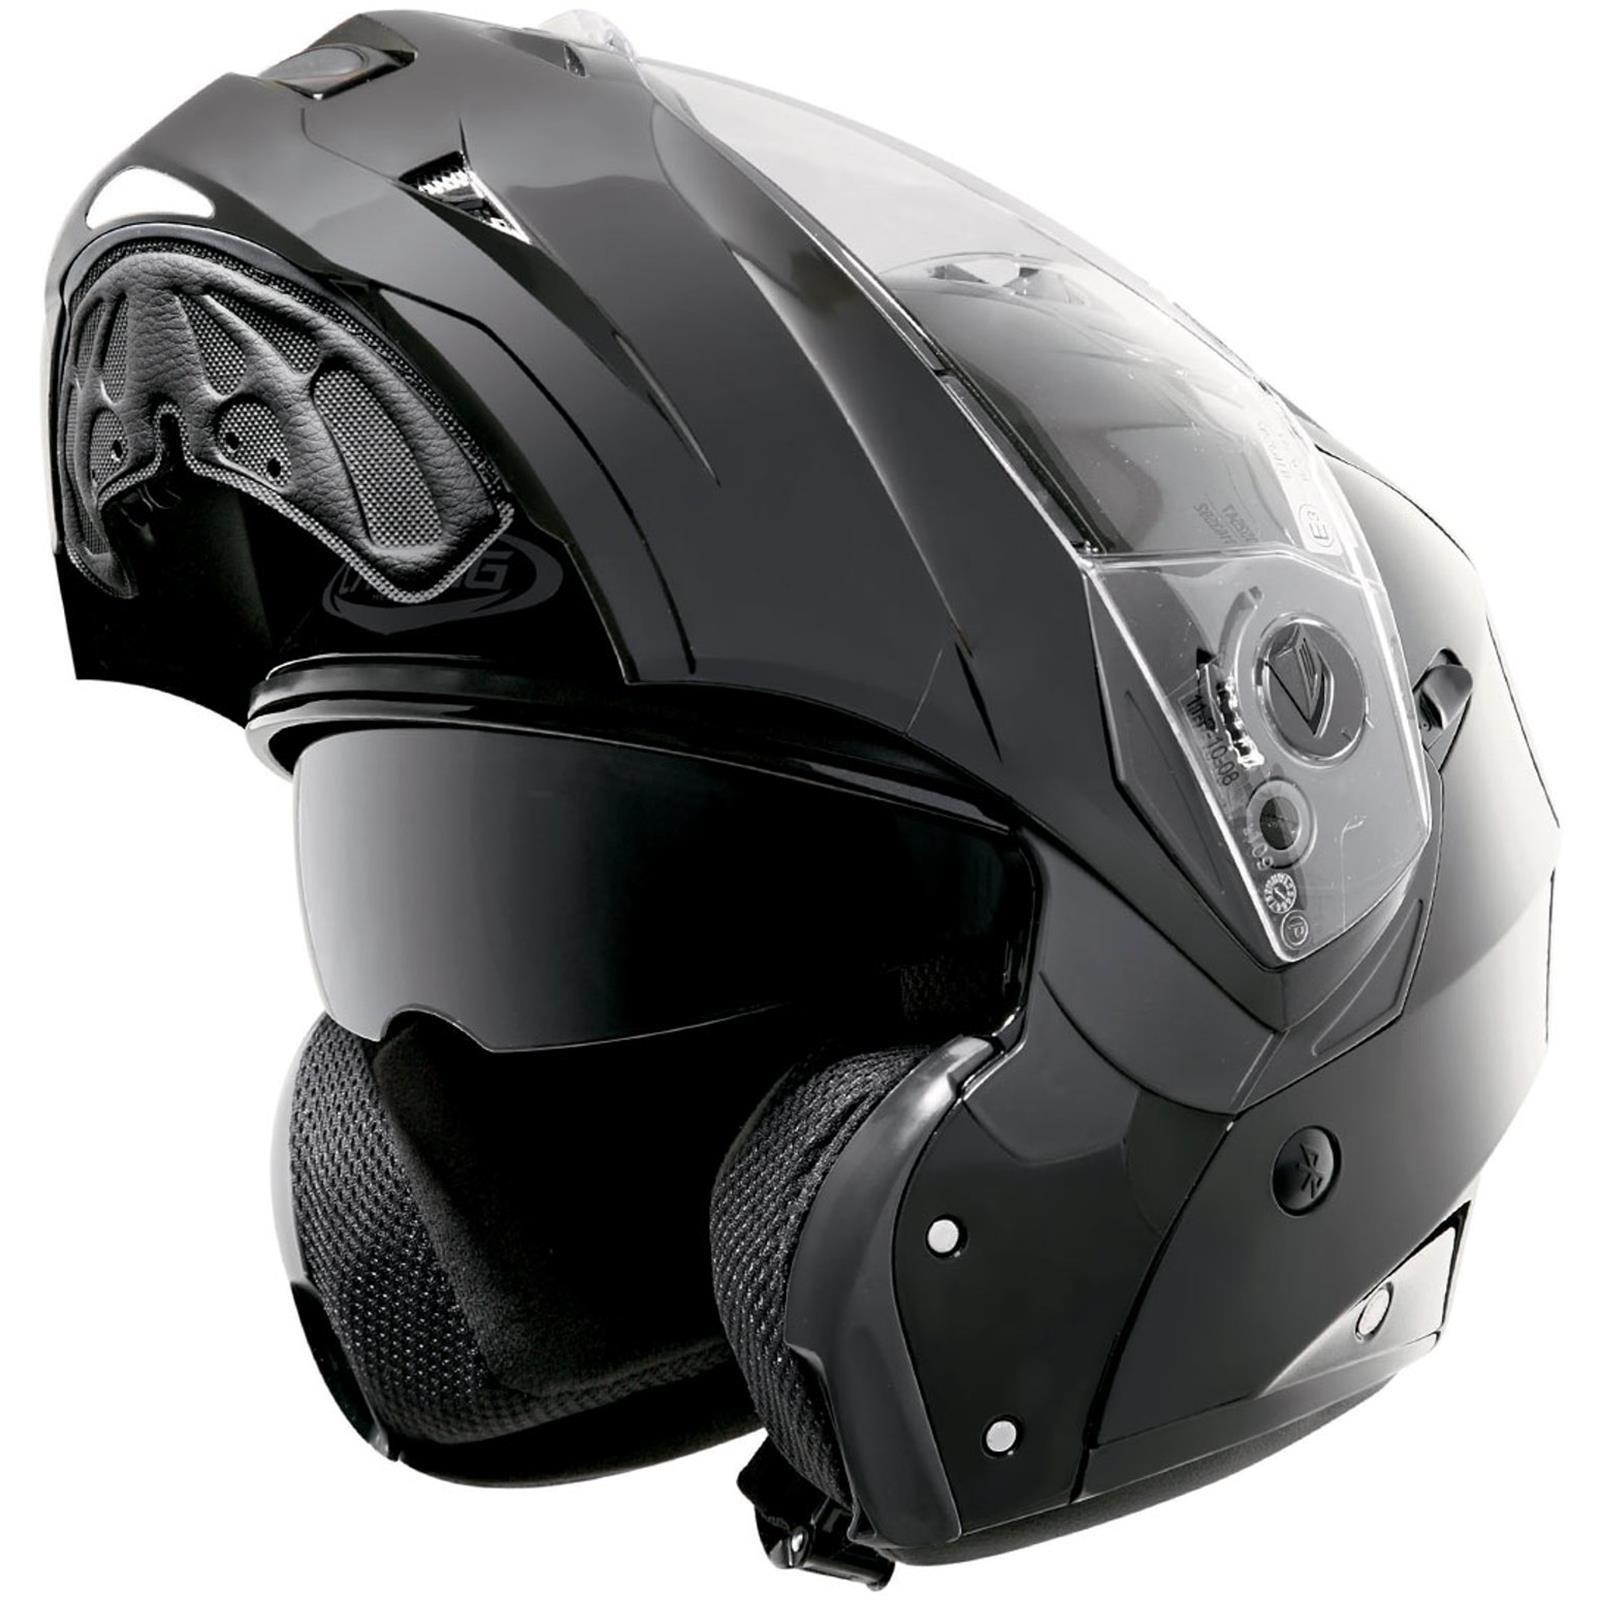 Caberg-Klapp-Helm-Duke-II-2-Smart-Schwarz-Motorrad-Sonnenblende-Pinlock-Jet Indexbild 5